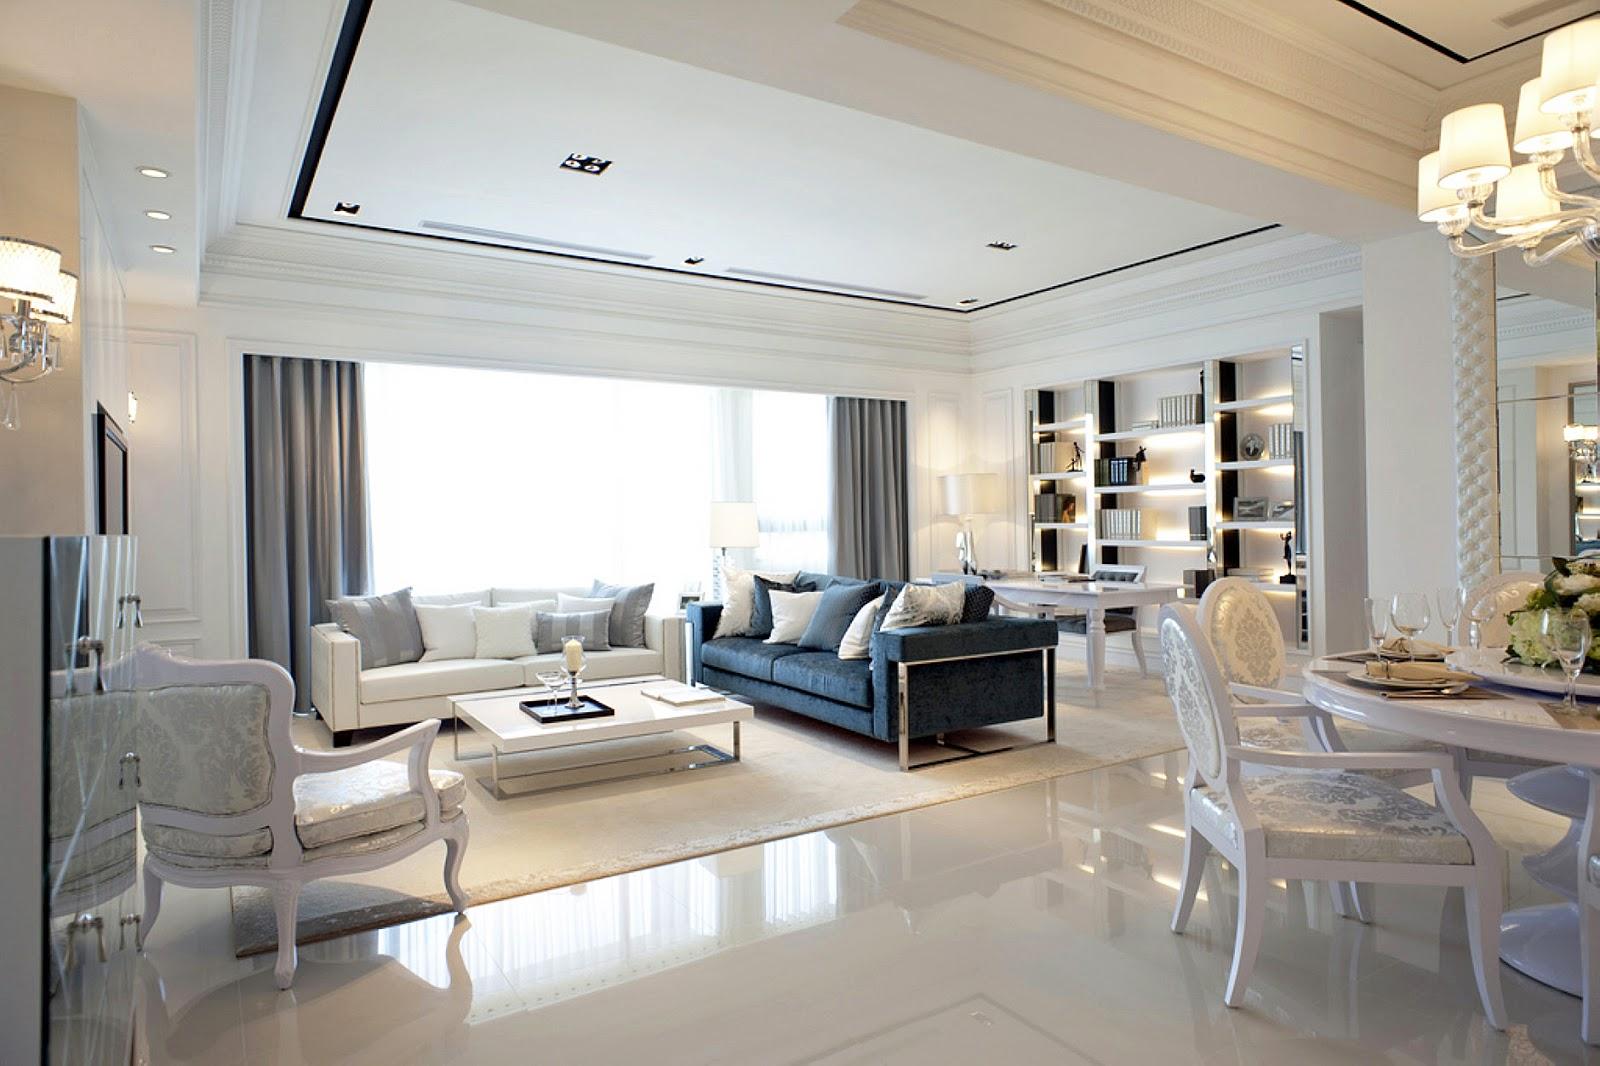 Am dolce vita our taiwan trip interior design Clean modern interior design